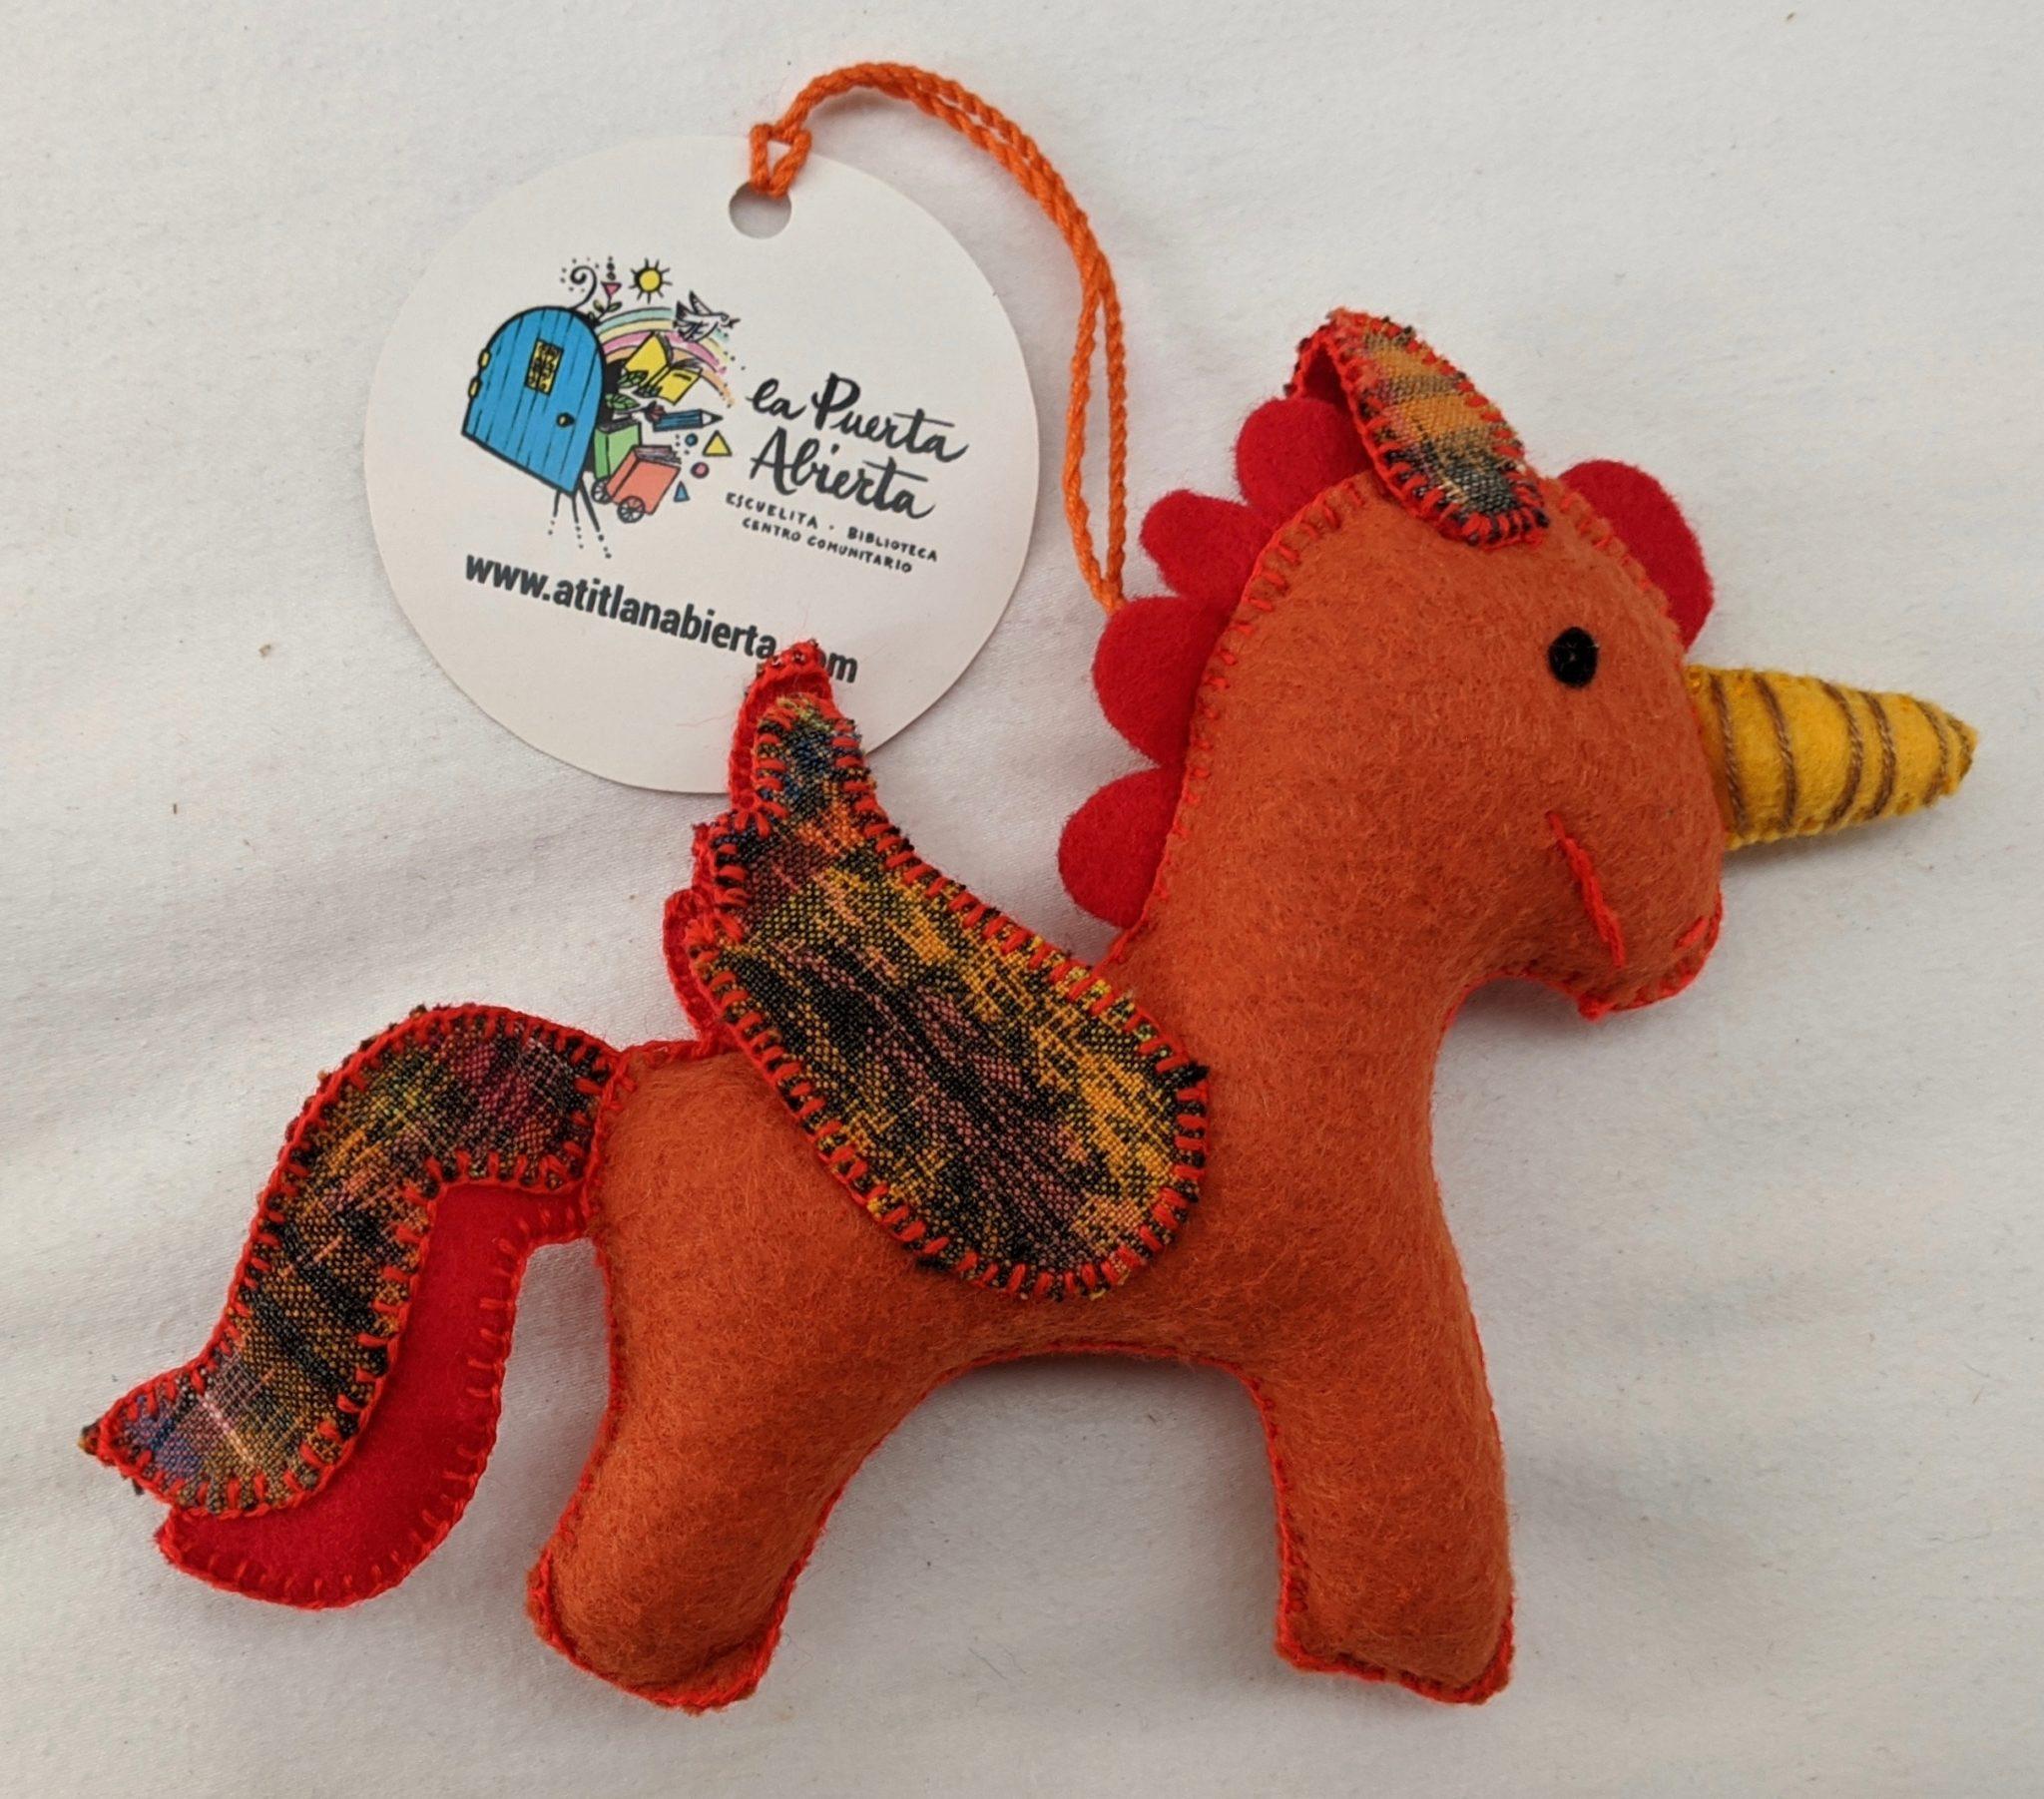 Unicorn Ornament - Felt and Repurposed Traditional Fabric